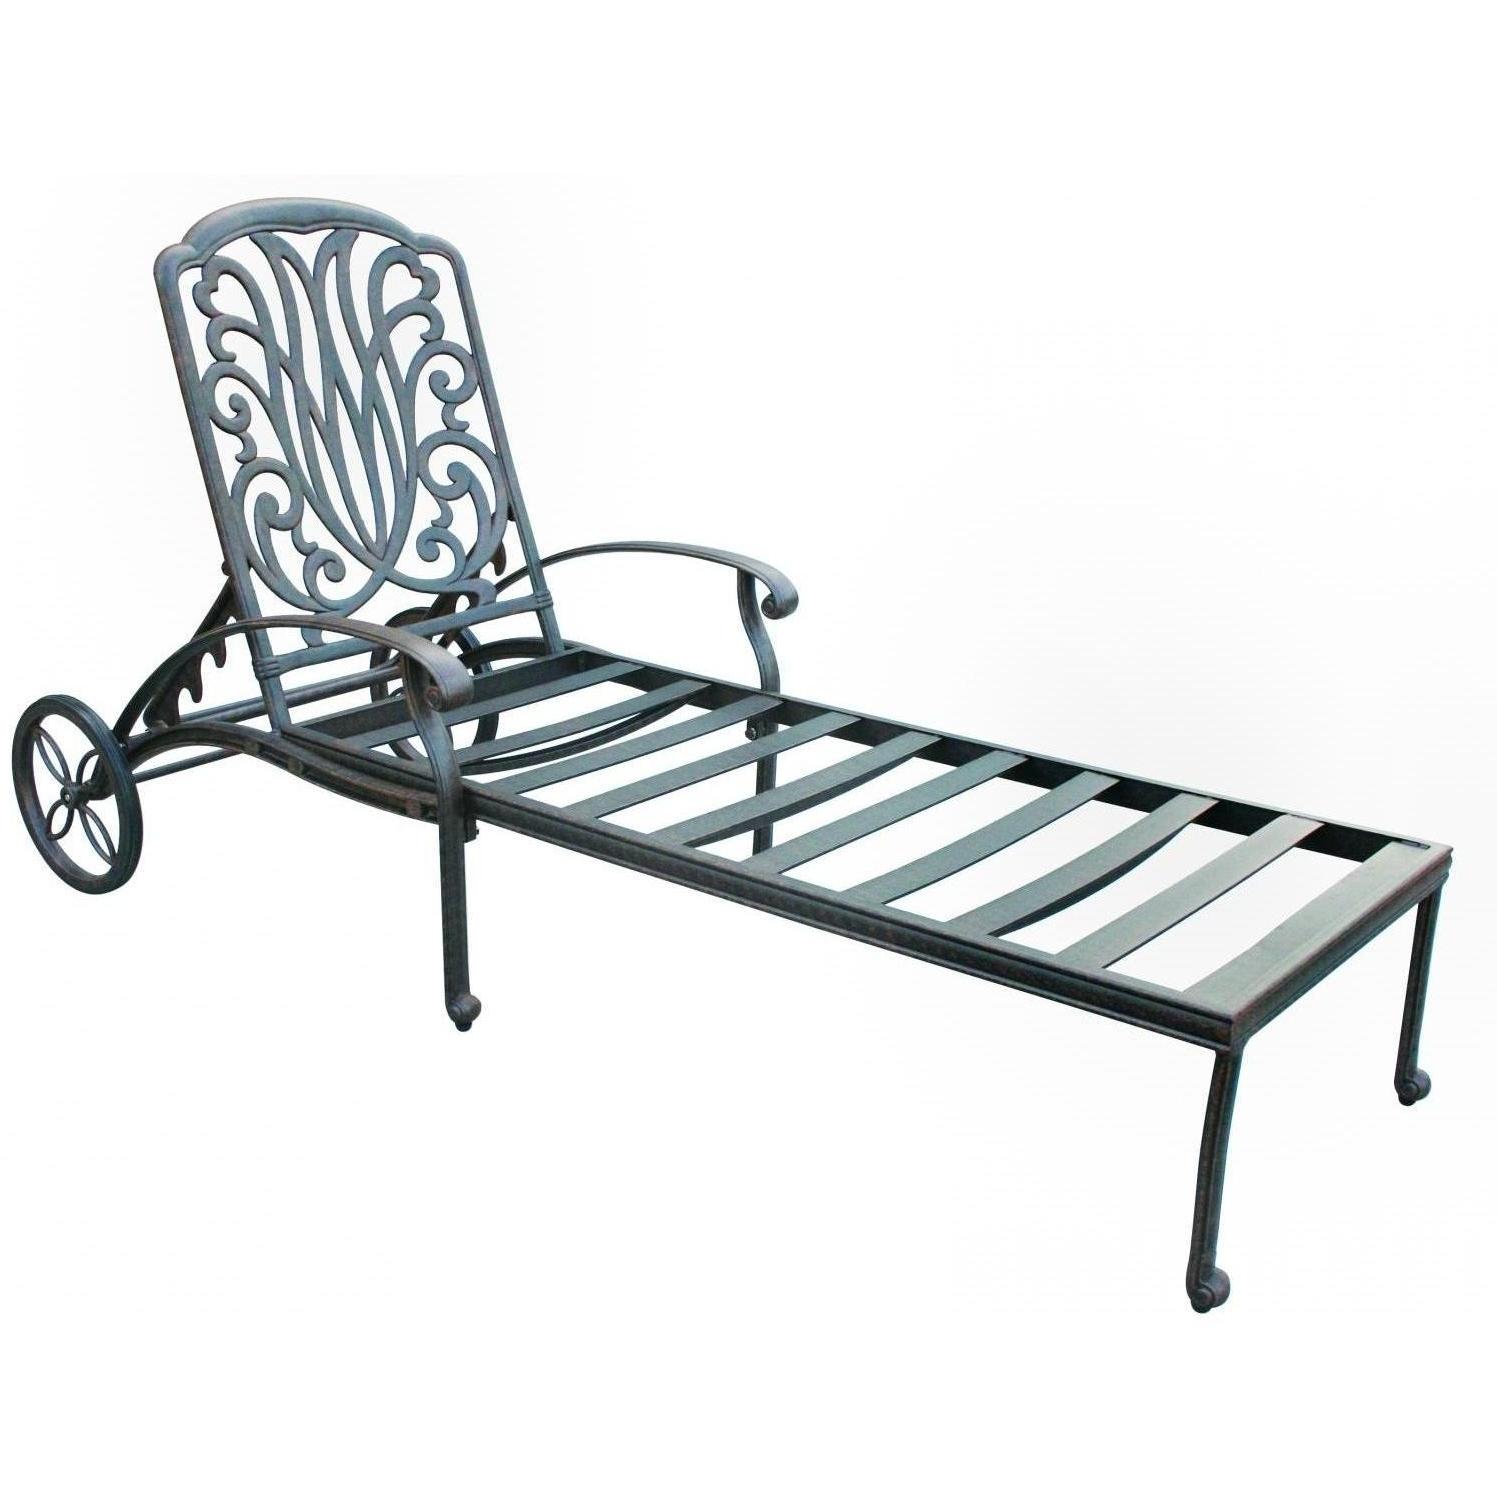 Darlee Elisabeth Cast Aluminum Patio Chaise Lounge : Ultimate Patio Regarding Most Current Cast Aluminum Chaise Lounges With Wheels (View 12 of 15)